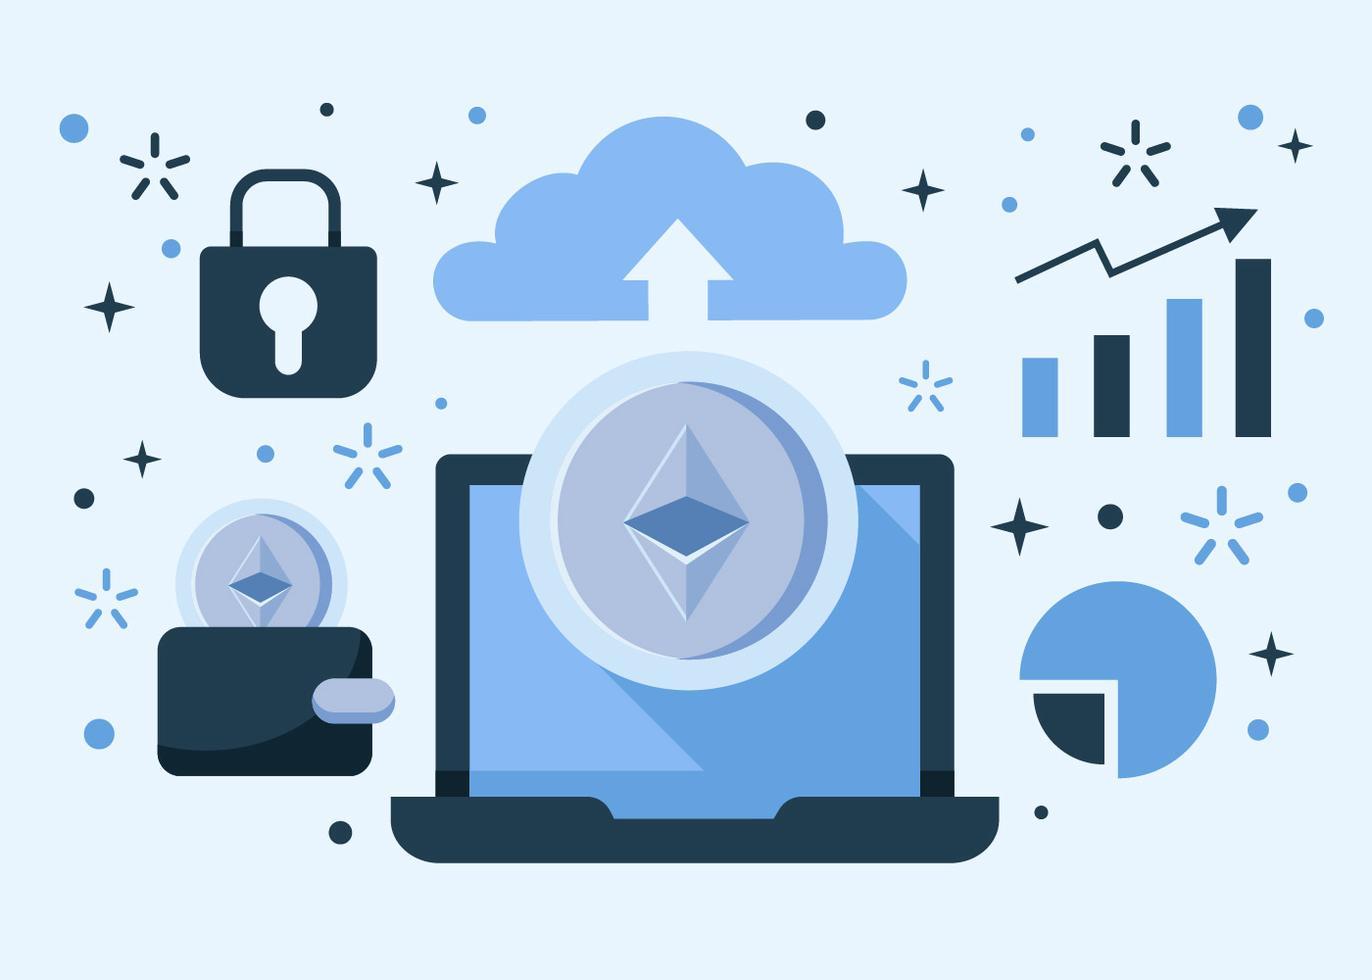 etherum-cryptocurrency-vector